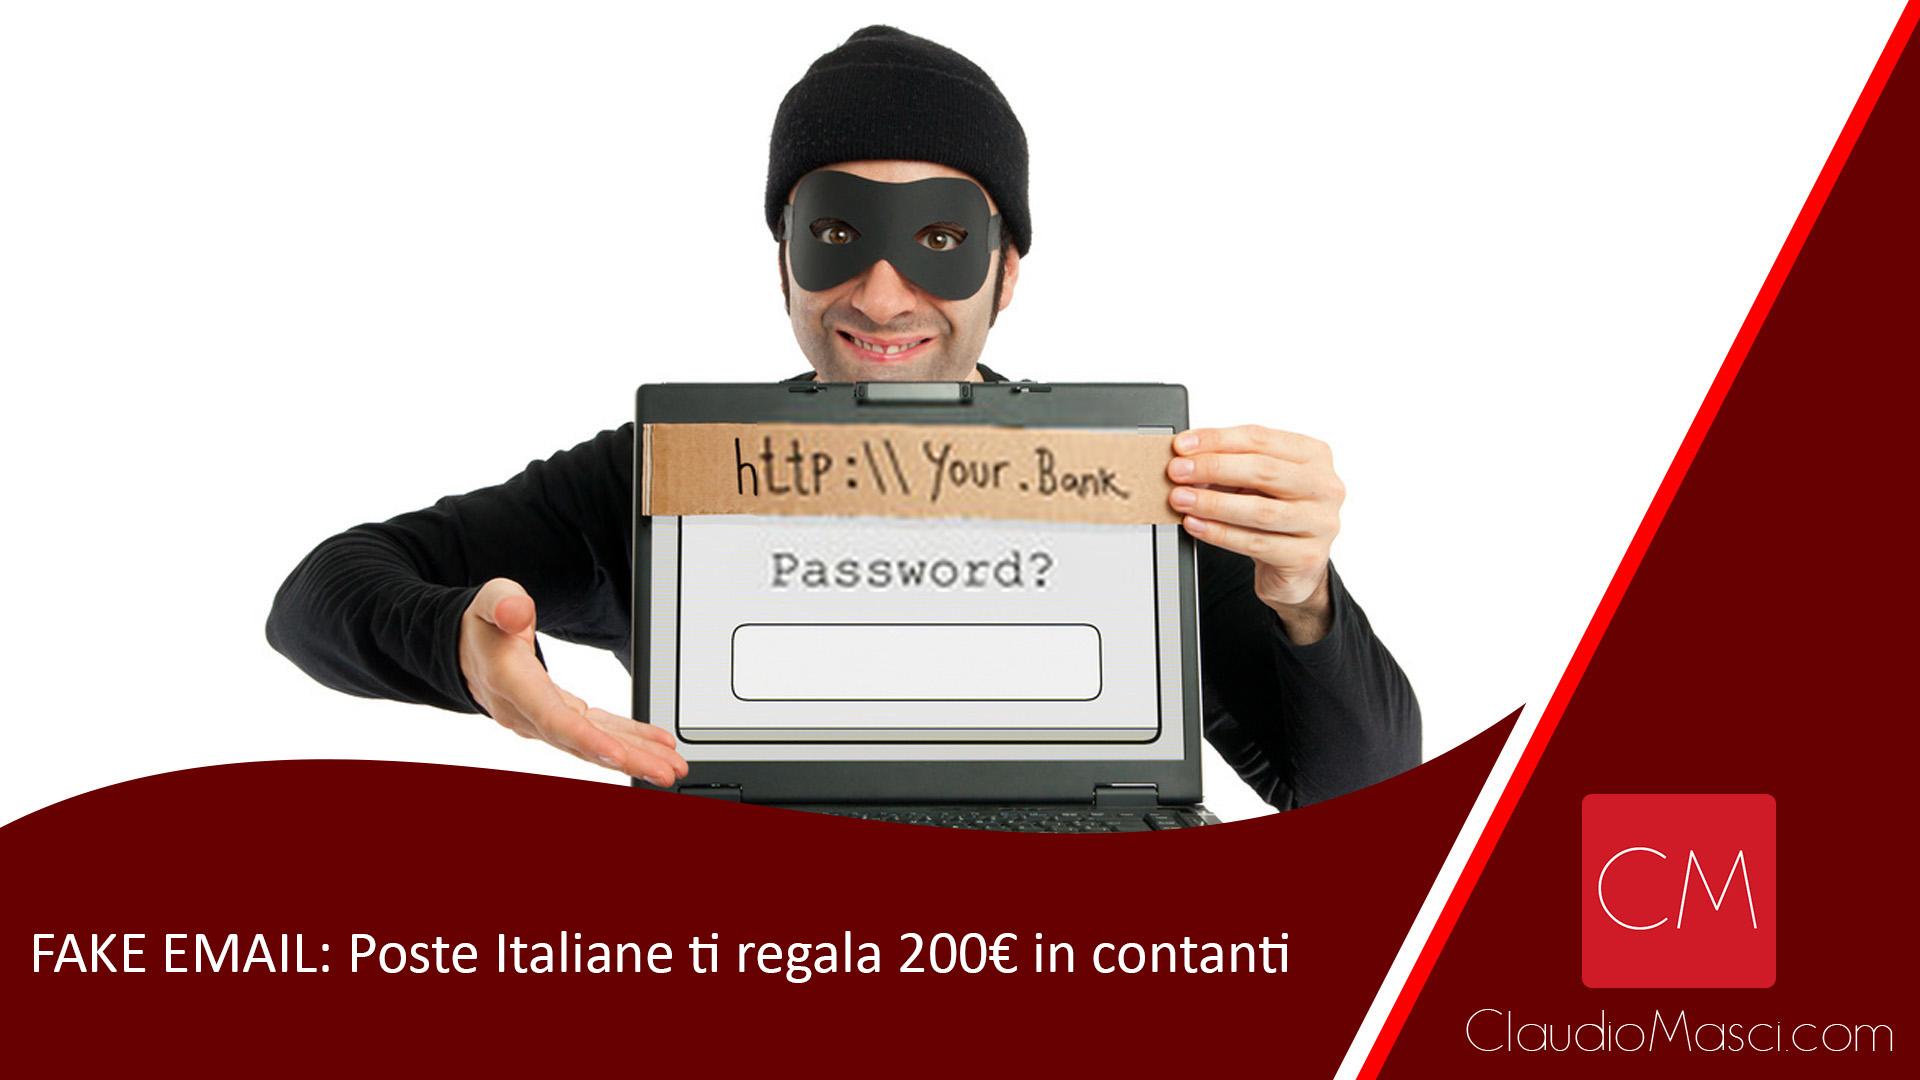 FAKE EMAIL: Poste Italiane ti regala 200€ in contanti